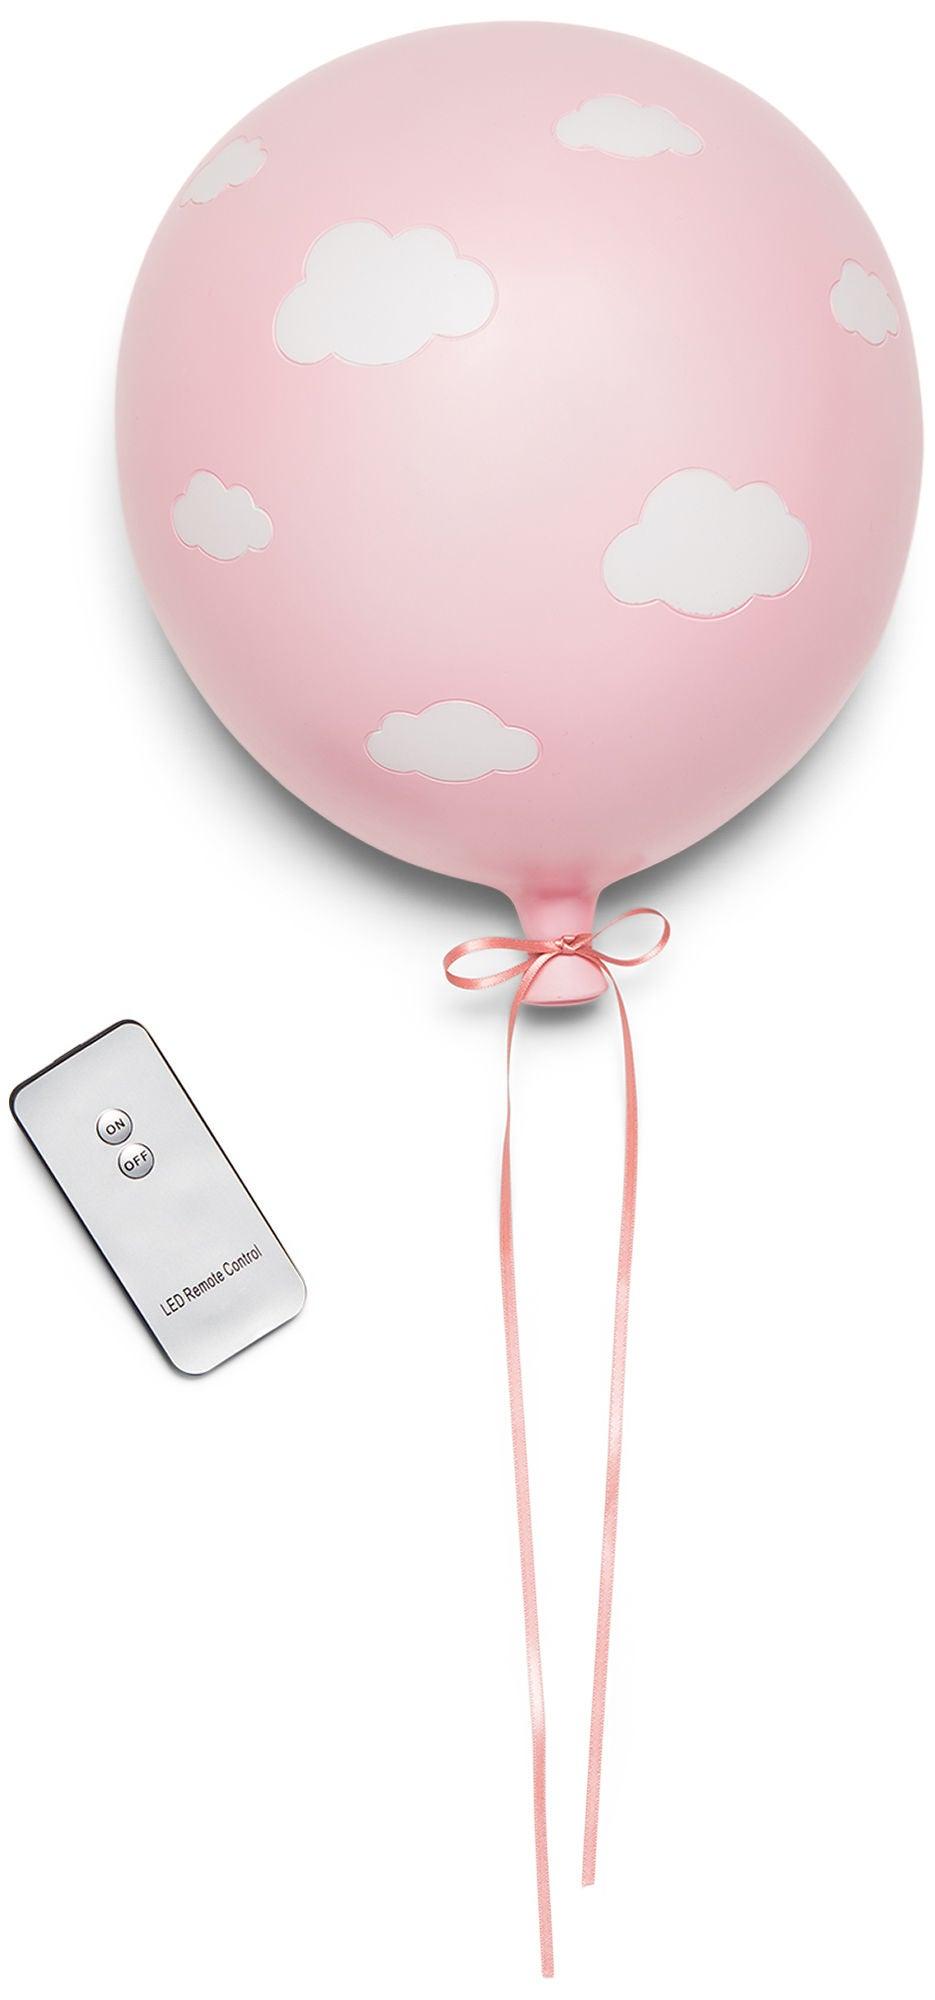 Lilou Lilou Seinävalaisin Ilmapallo Pilvi, Pink/White